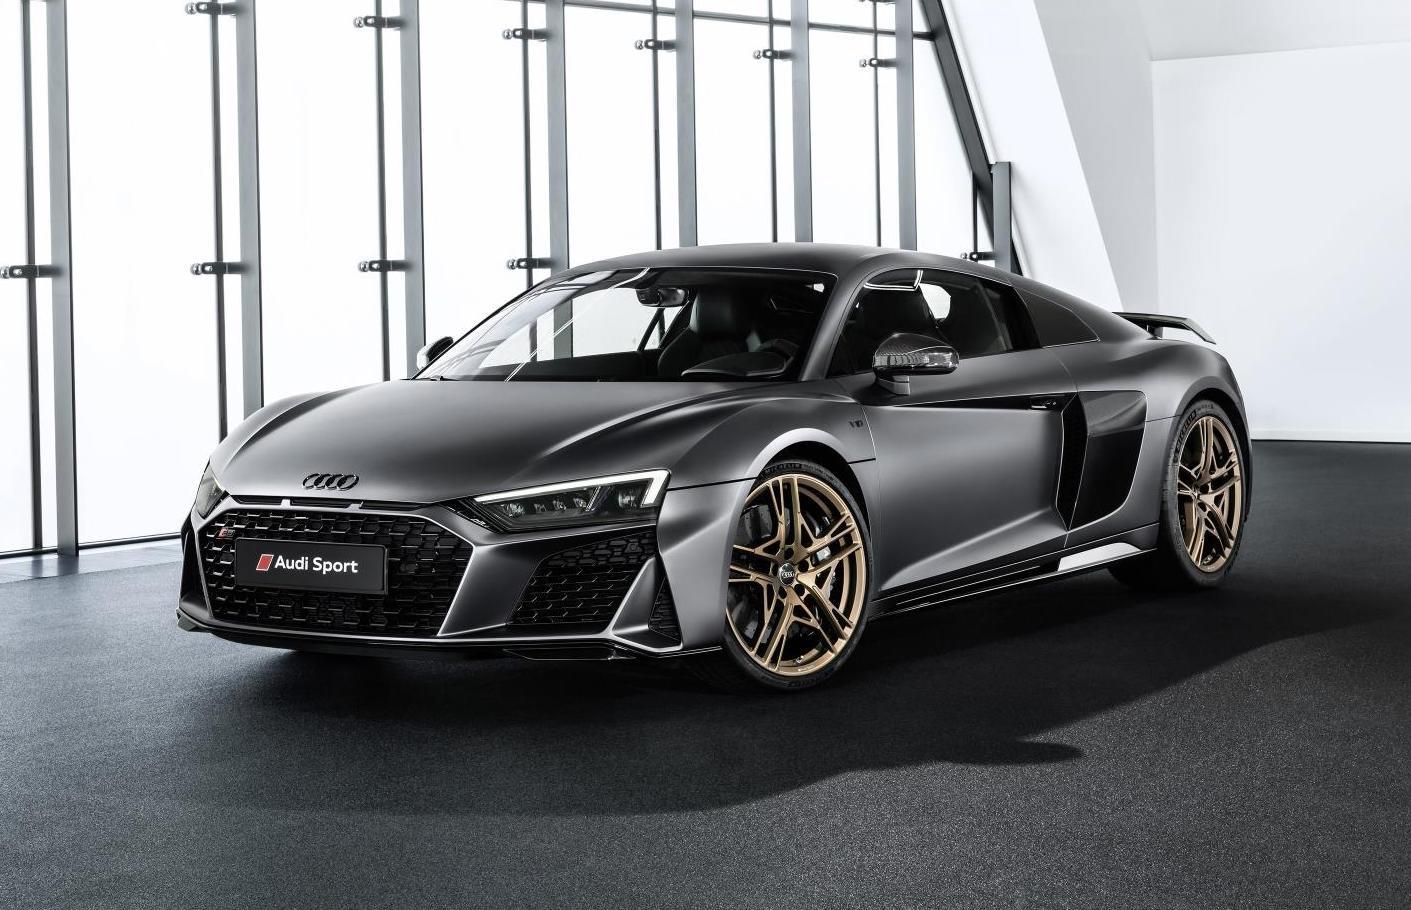 Audi R8 Decennium edition celebrates 10 years of V10